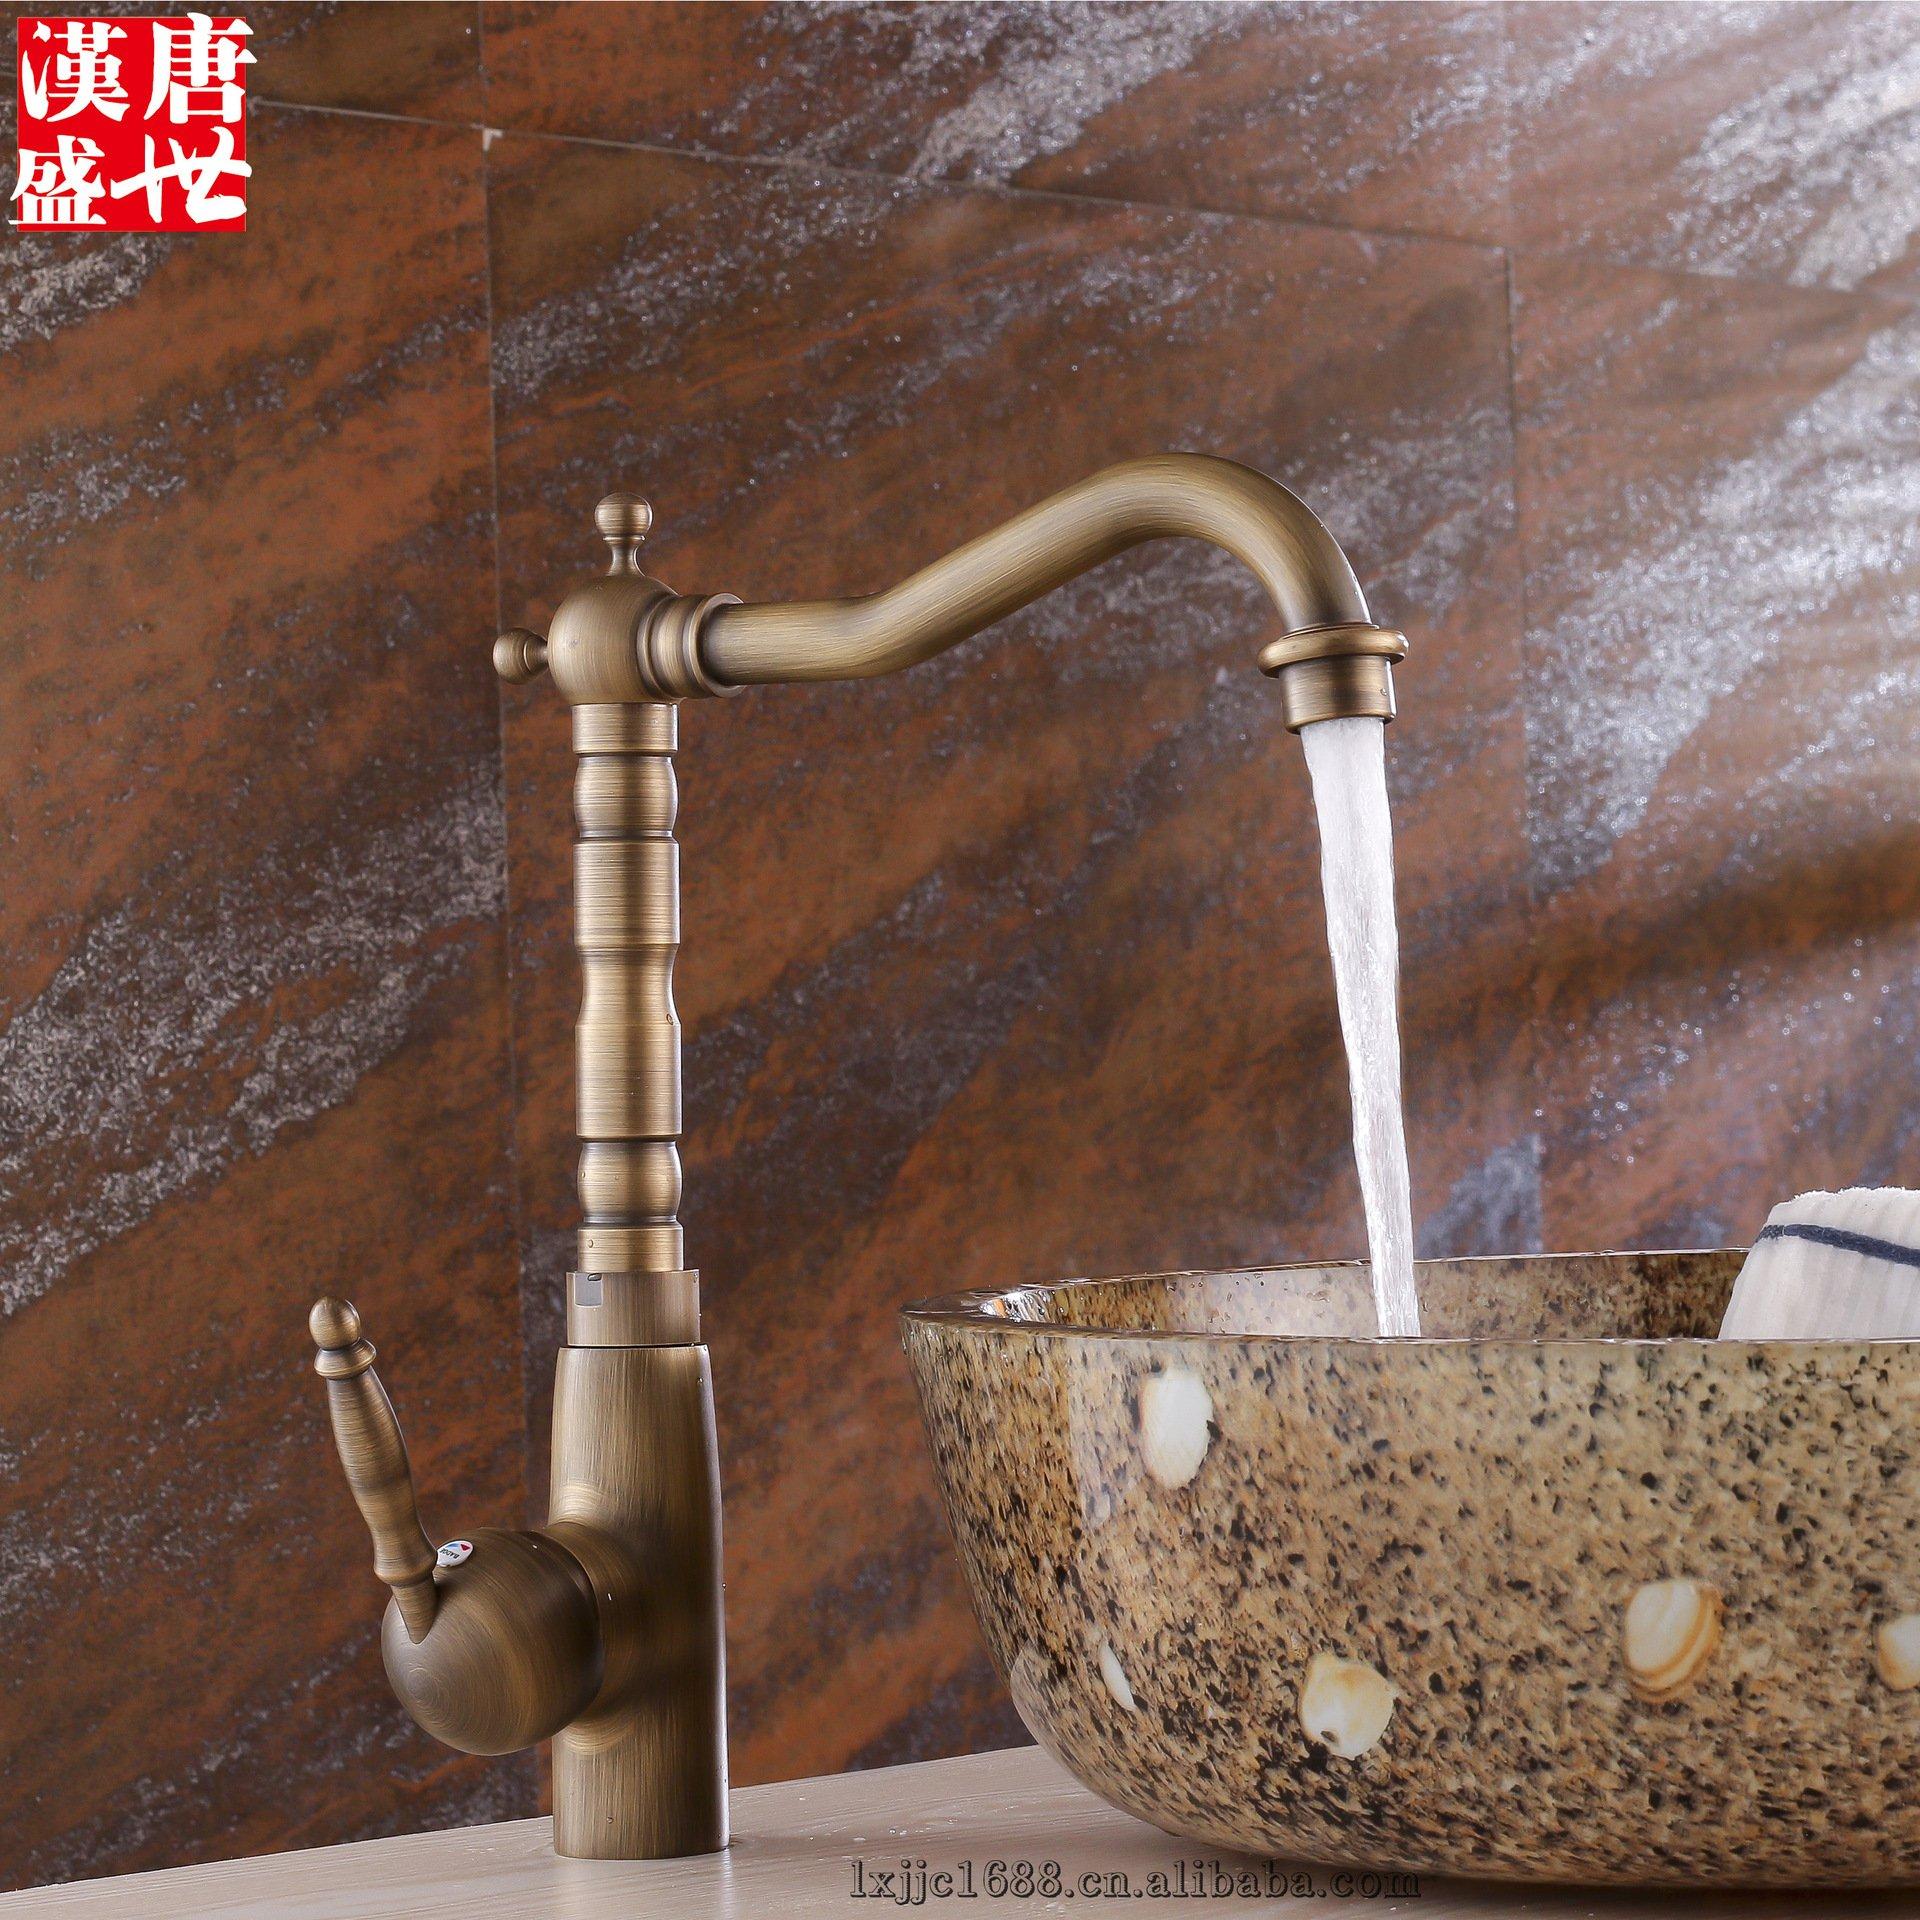 Furesnts Modern home kitchen and Bathroom Sink Taps all bronze continental antique kitchen sink hot cold running water Basin sink Basin Mixer Bathroom Sink Taps,(Standard G 1/2 universal hose ports)